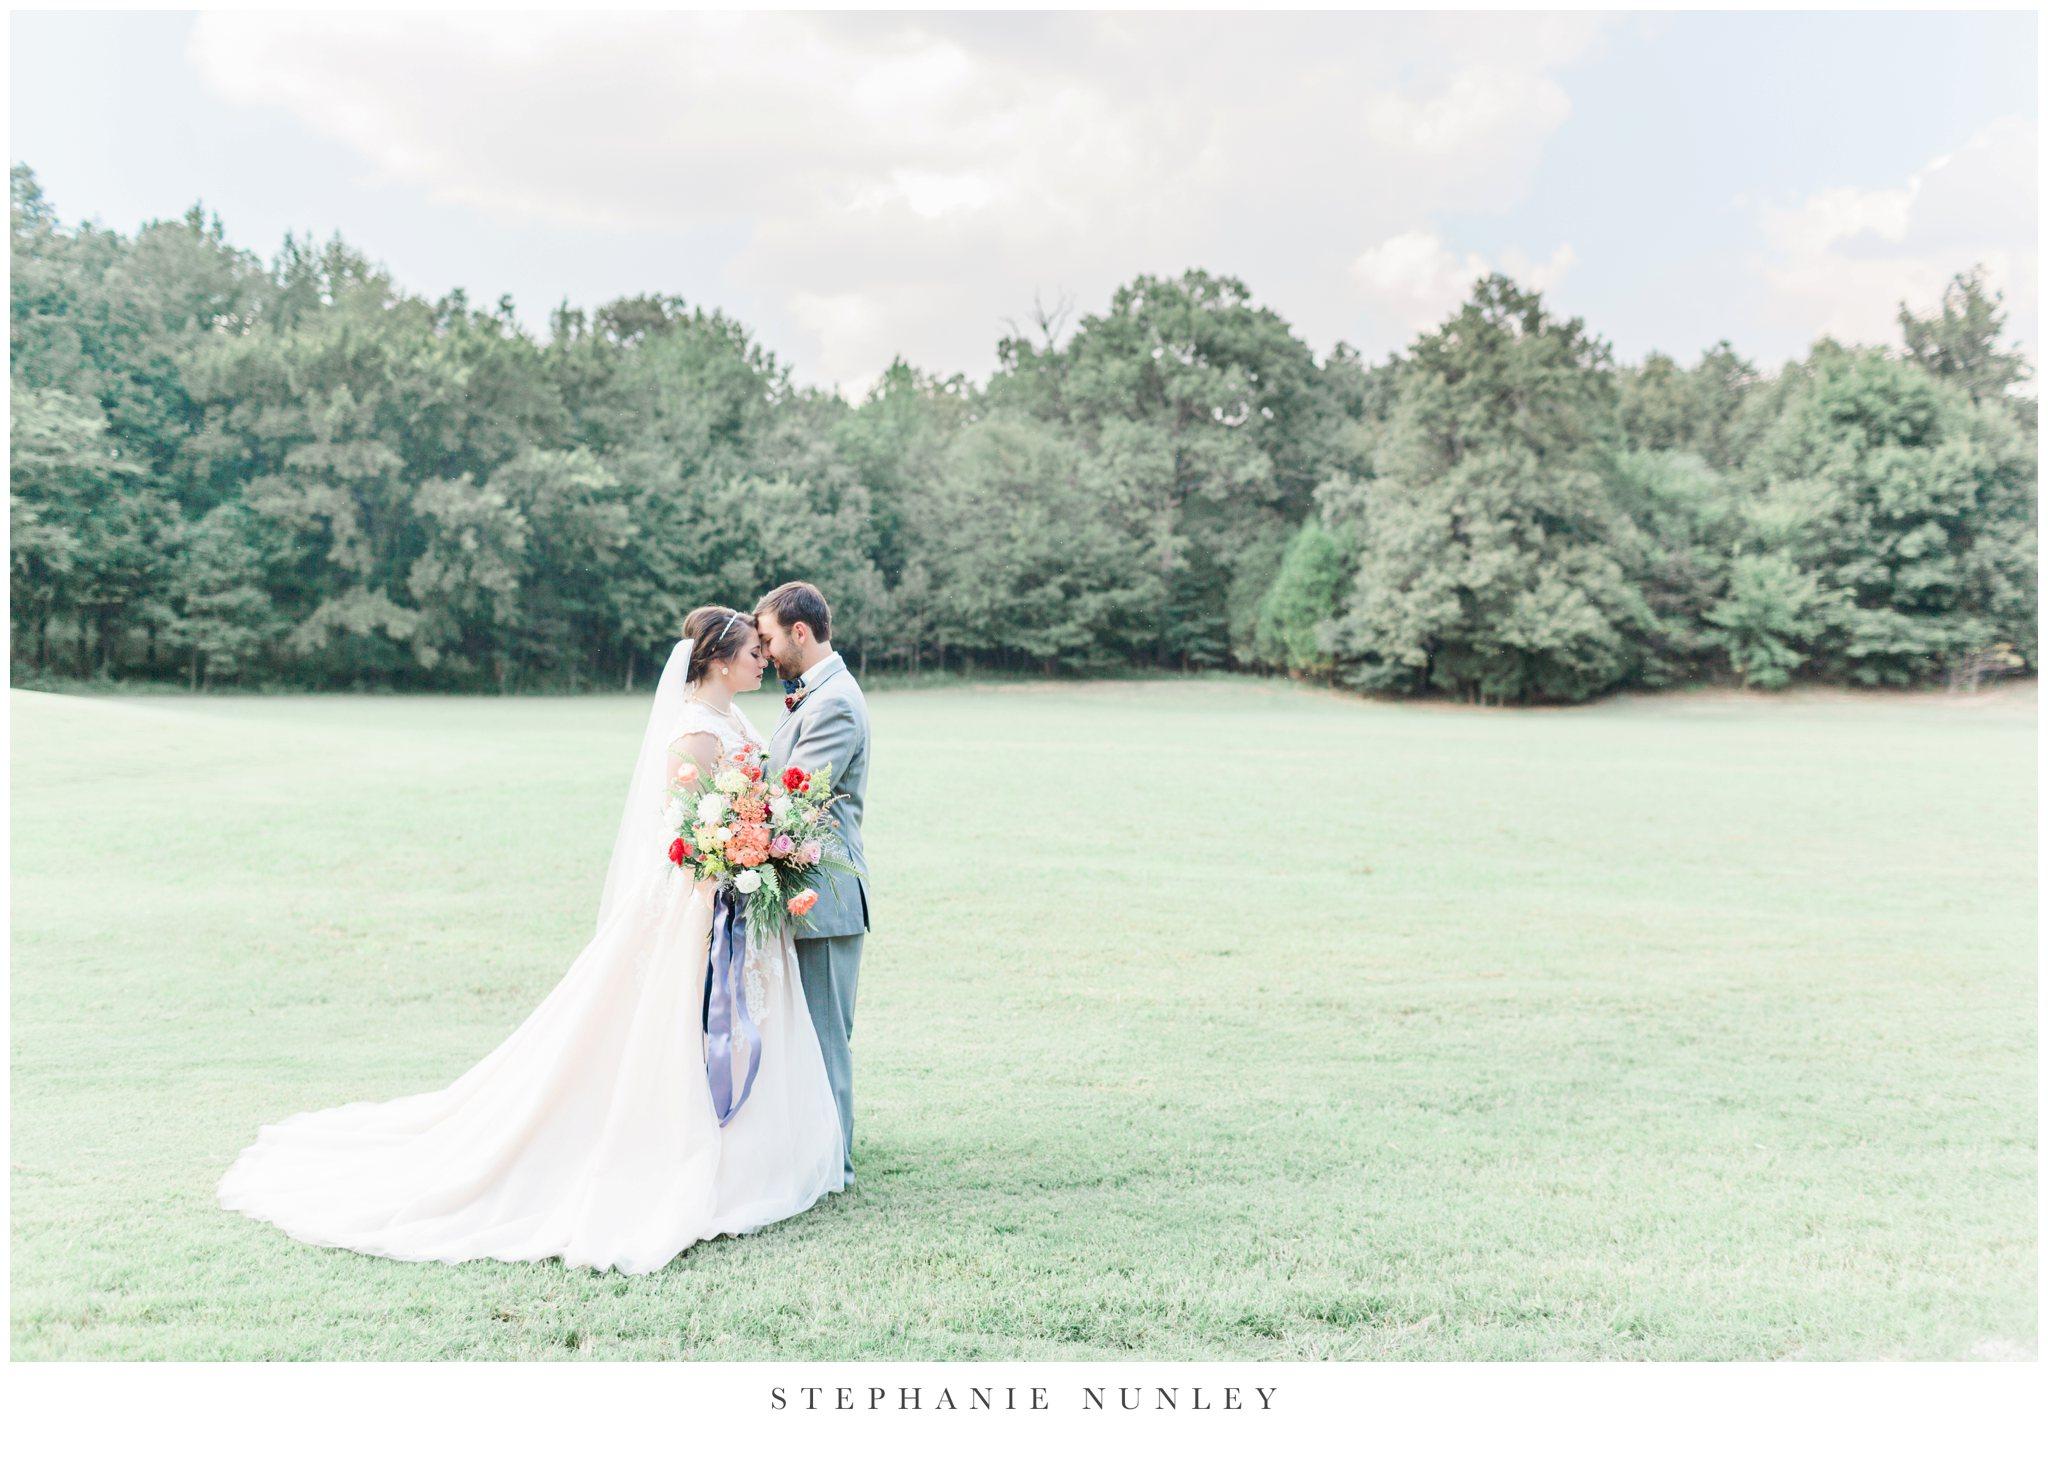 arkansas-wedding-with-lush-wildflower-bouquet-0082.jpg